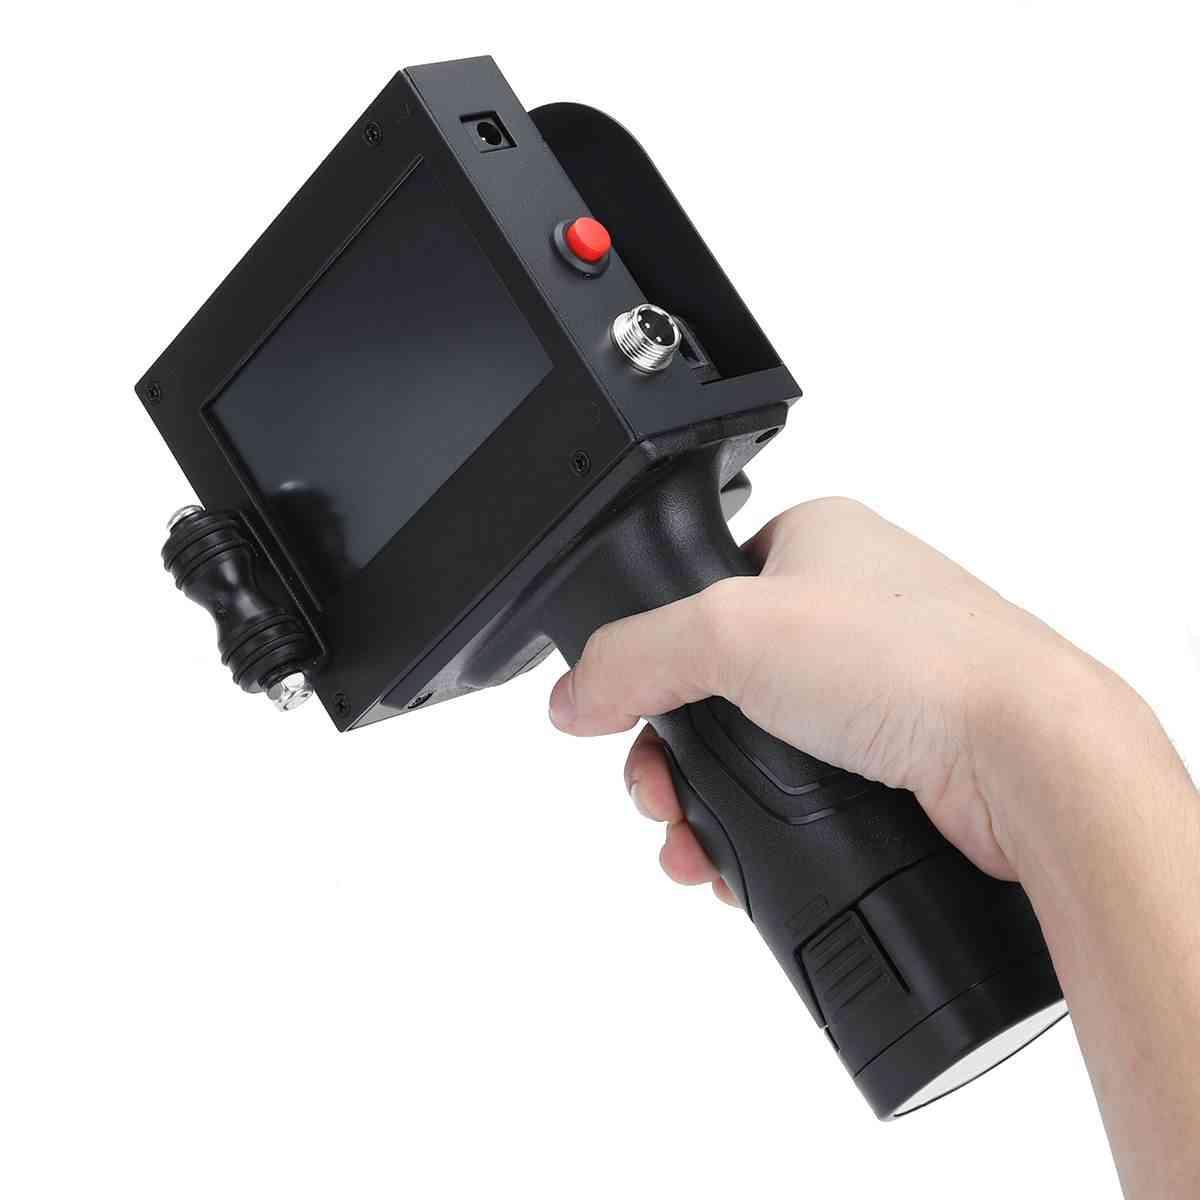 Hand Jet Handheld Thermal Inkjet Printer